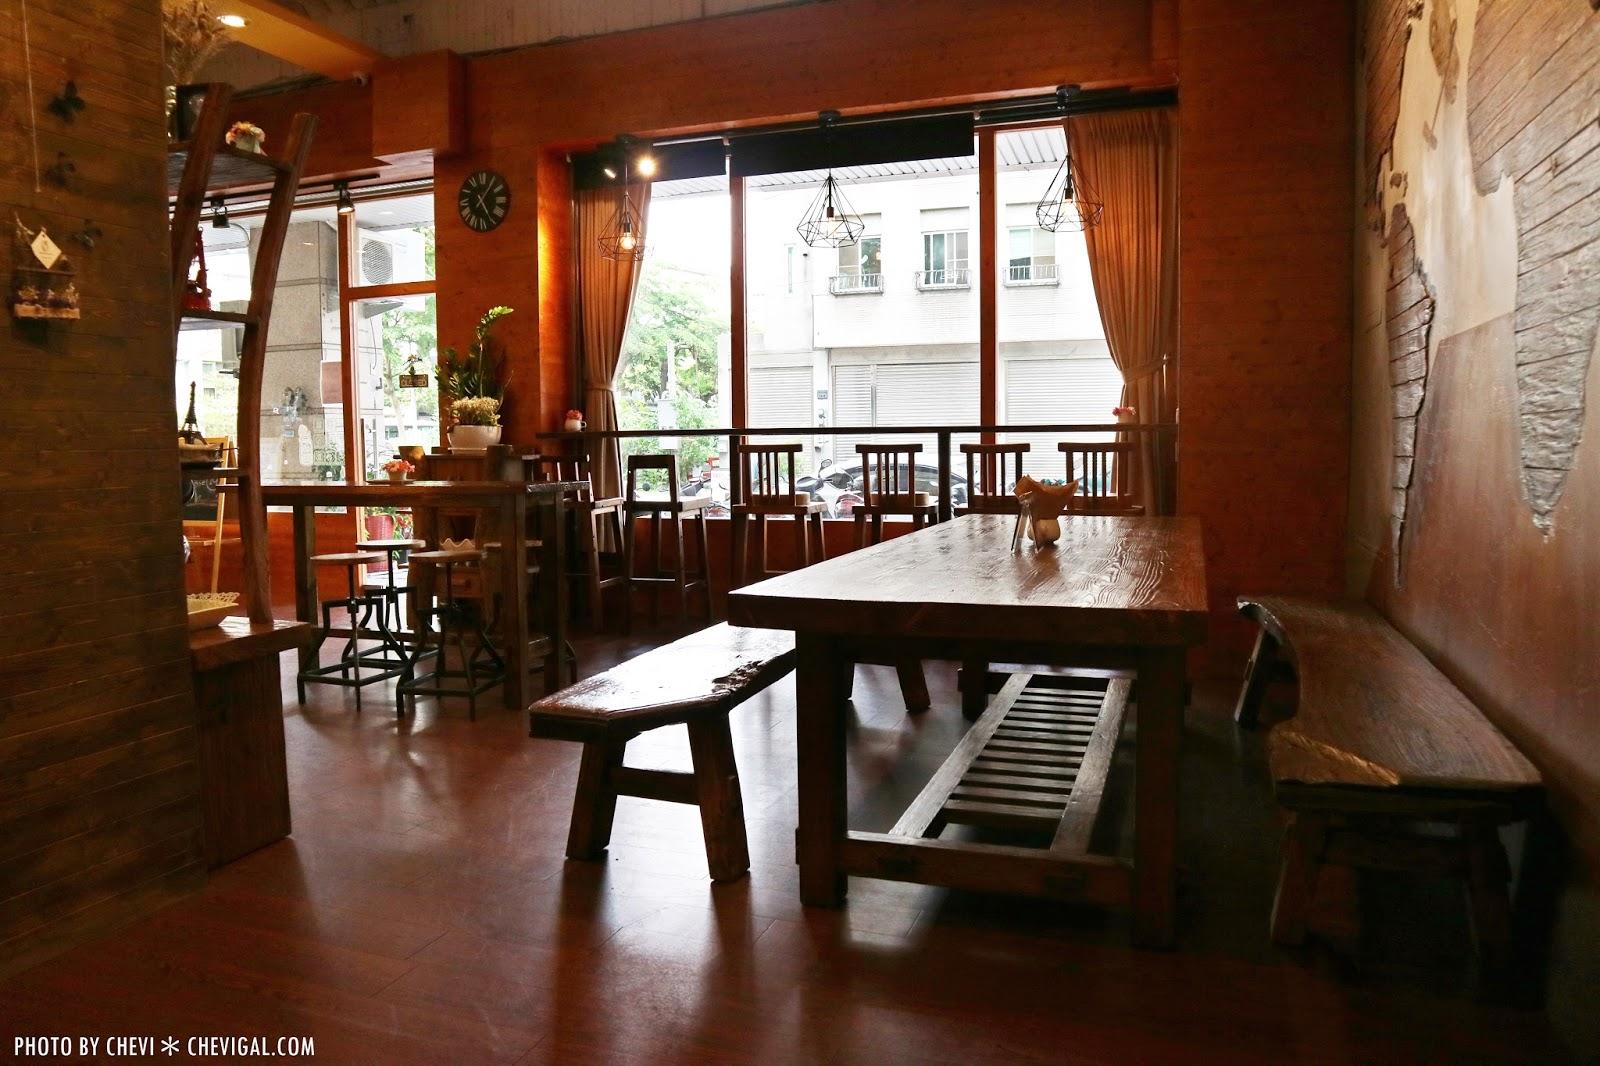 IMG 9541 - 台中烏日│FiMi 小後山廚房。新鮮手作法式甜點。森林清新風格好放鬆